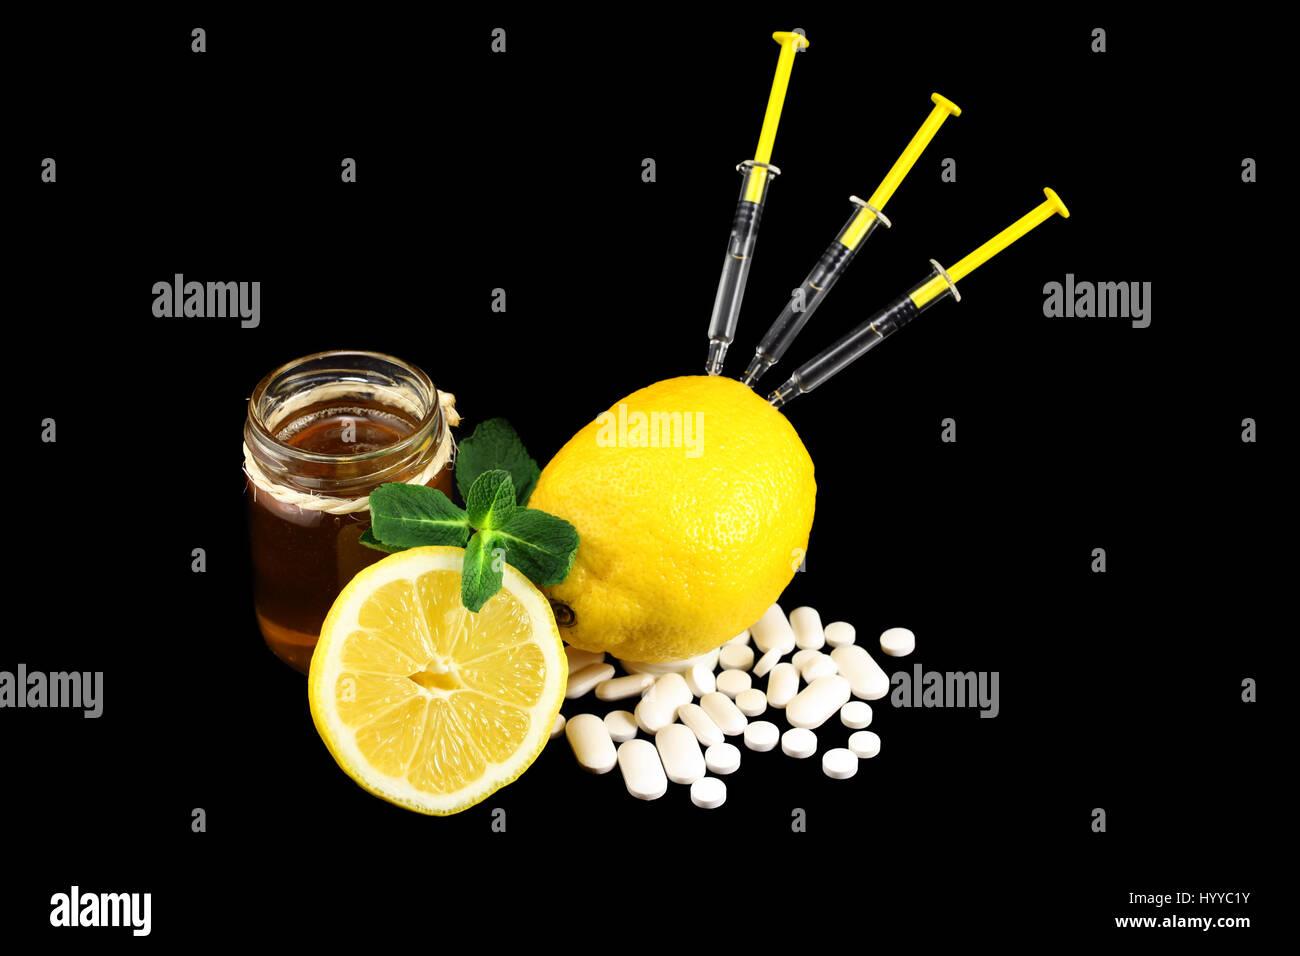 Dose of Vitamins - Stock Image